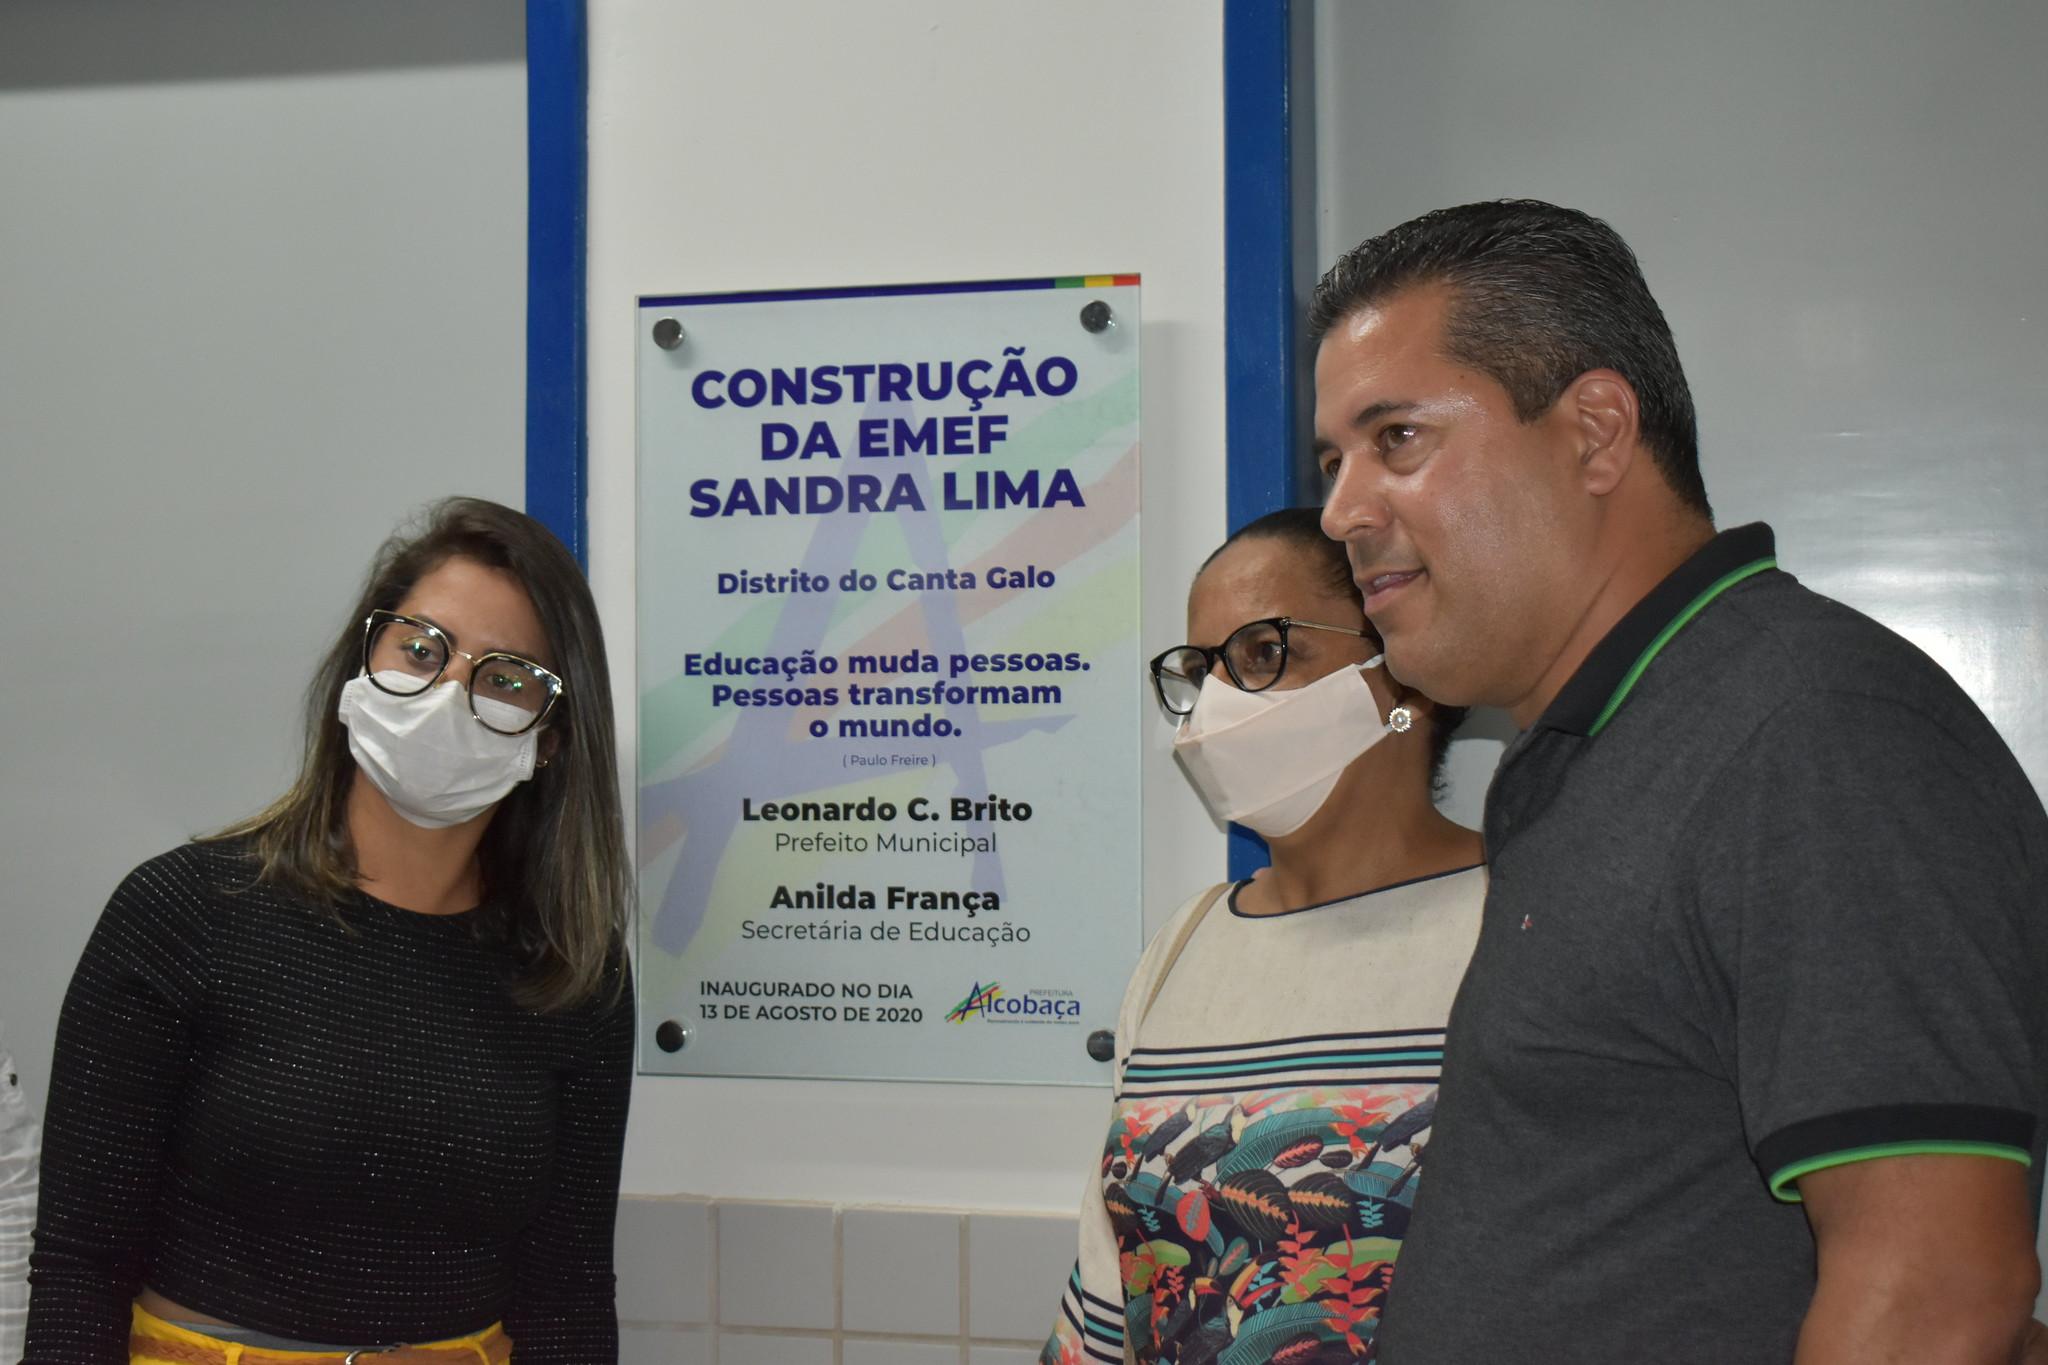 INAGURA DA EMEF SANDRA LIMA CANTA GALO (26)